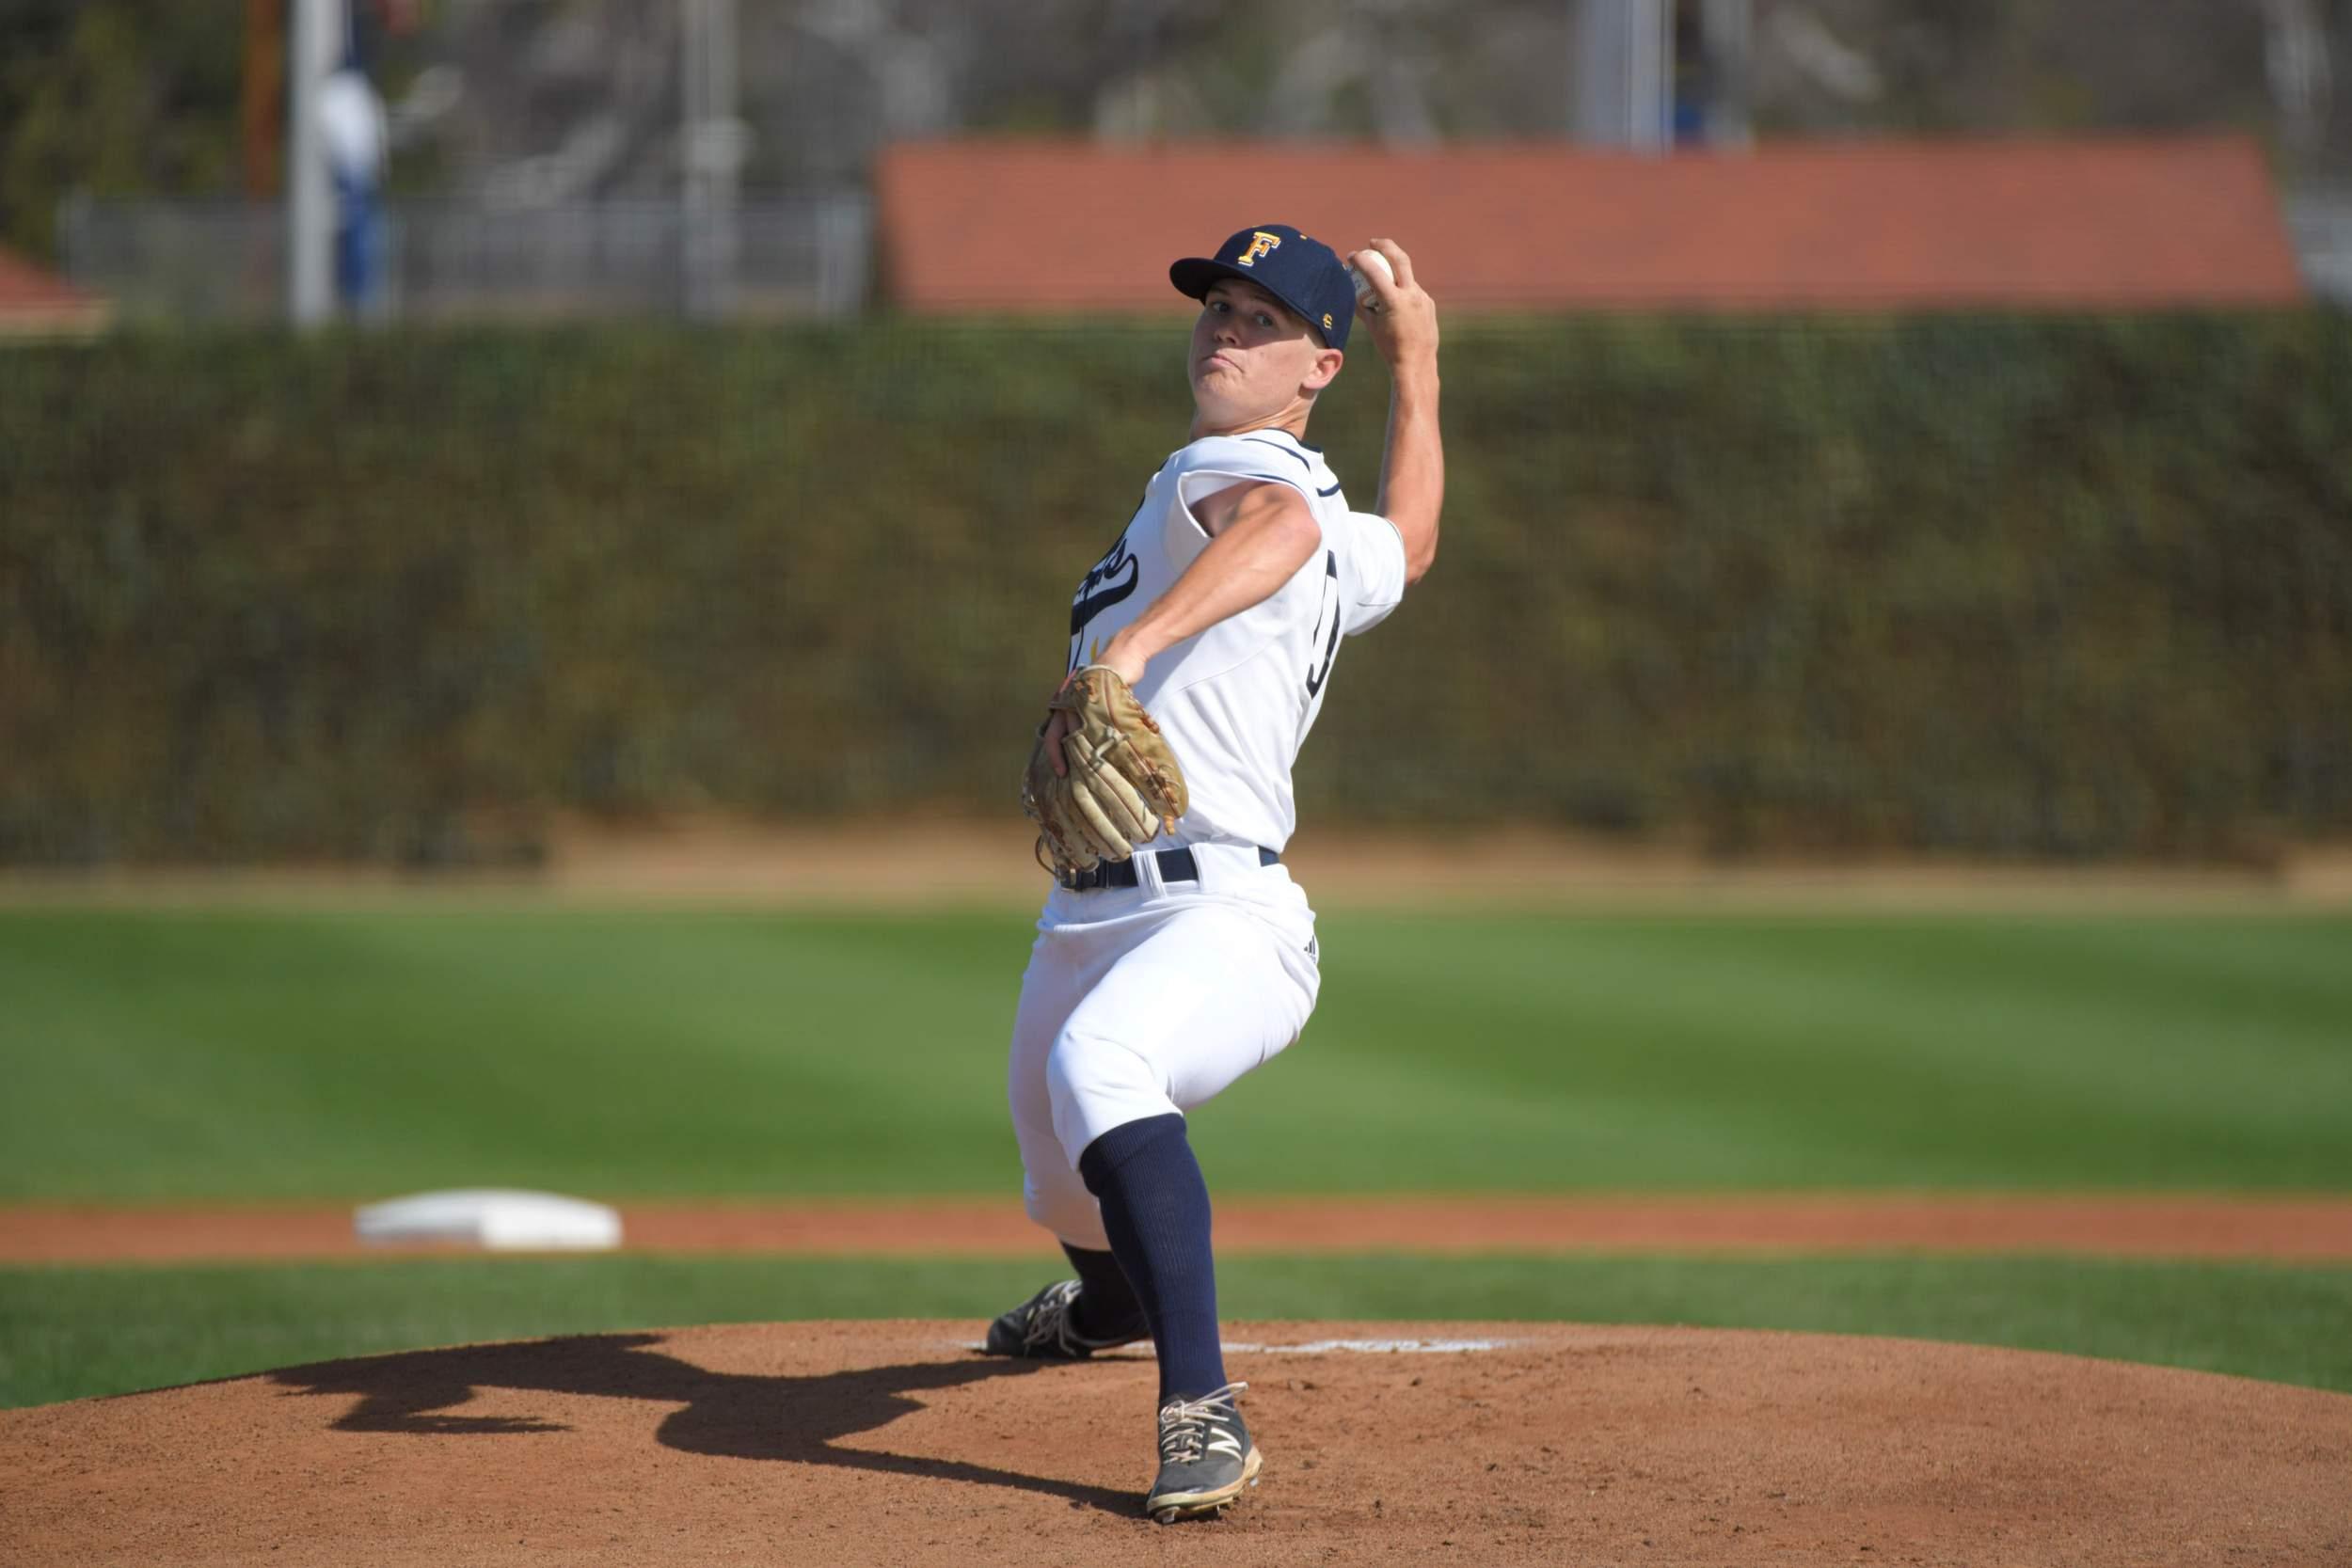 Bayfield's Heydinger Commits To University Of Akron Baseball For Univeristy Of Akron Calendar 2020